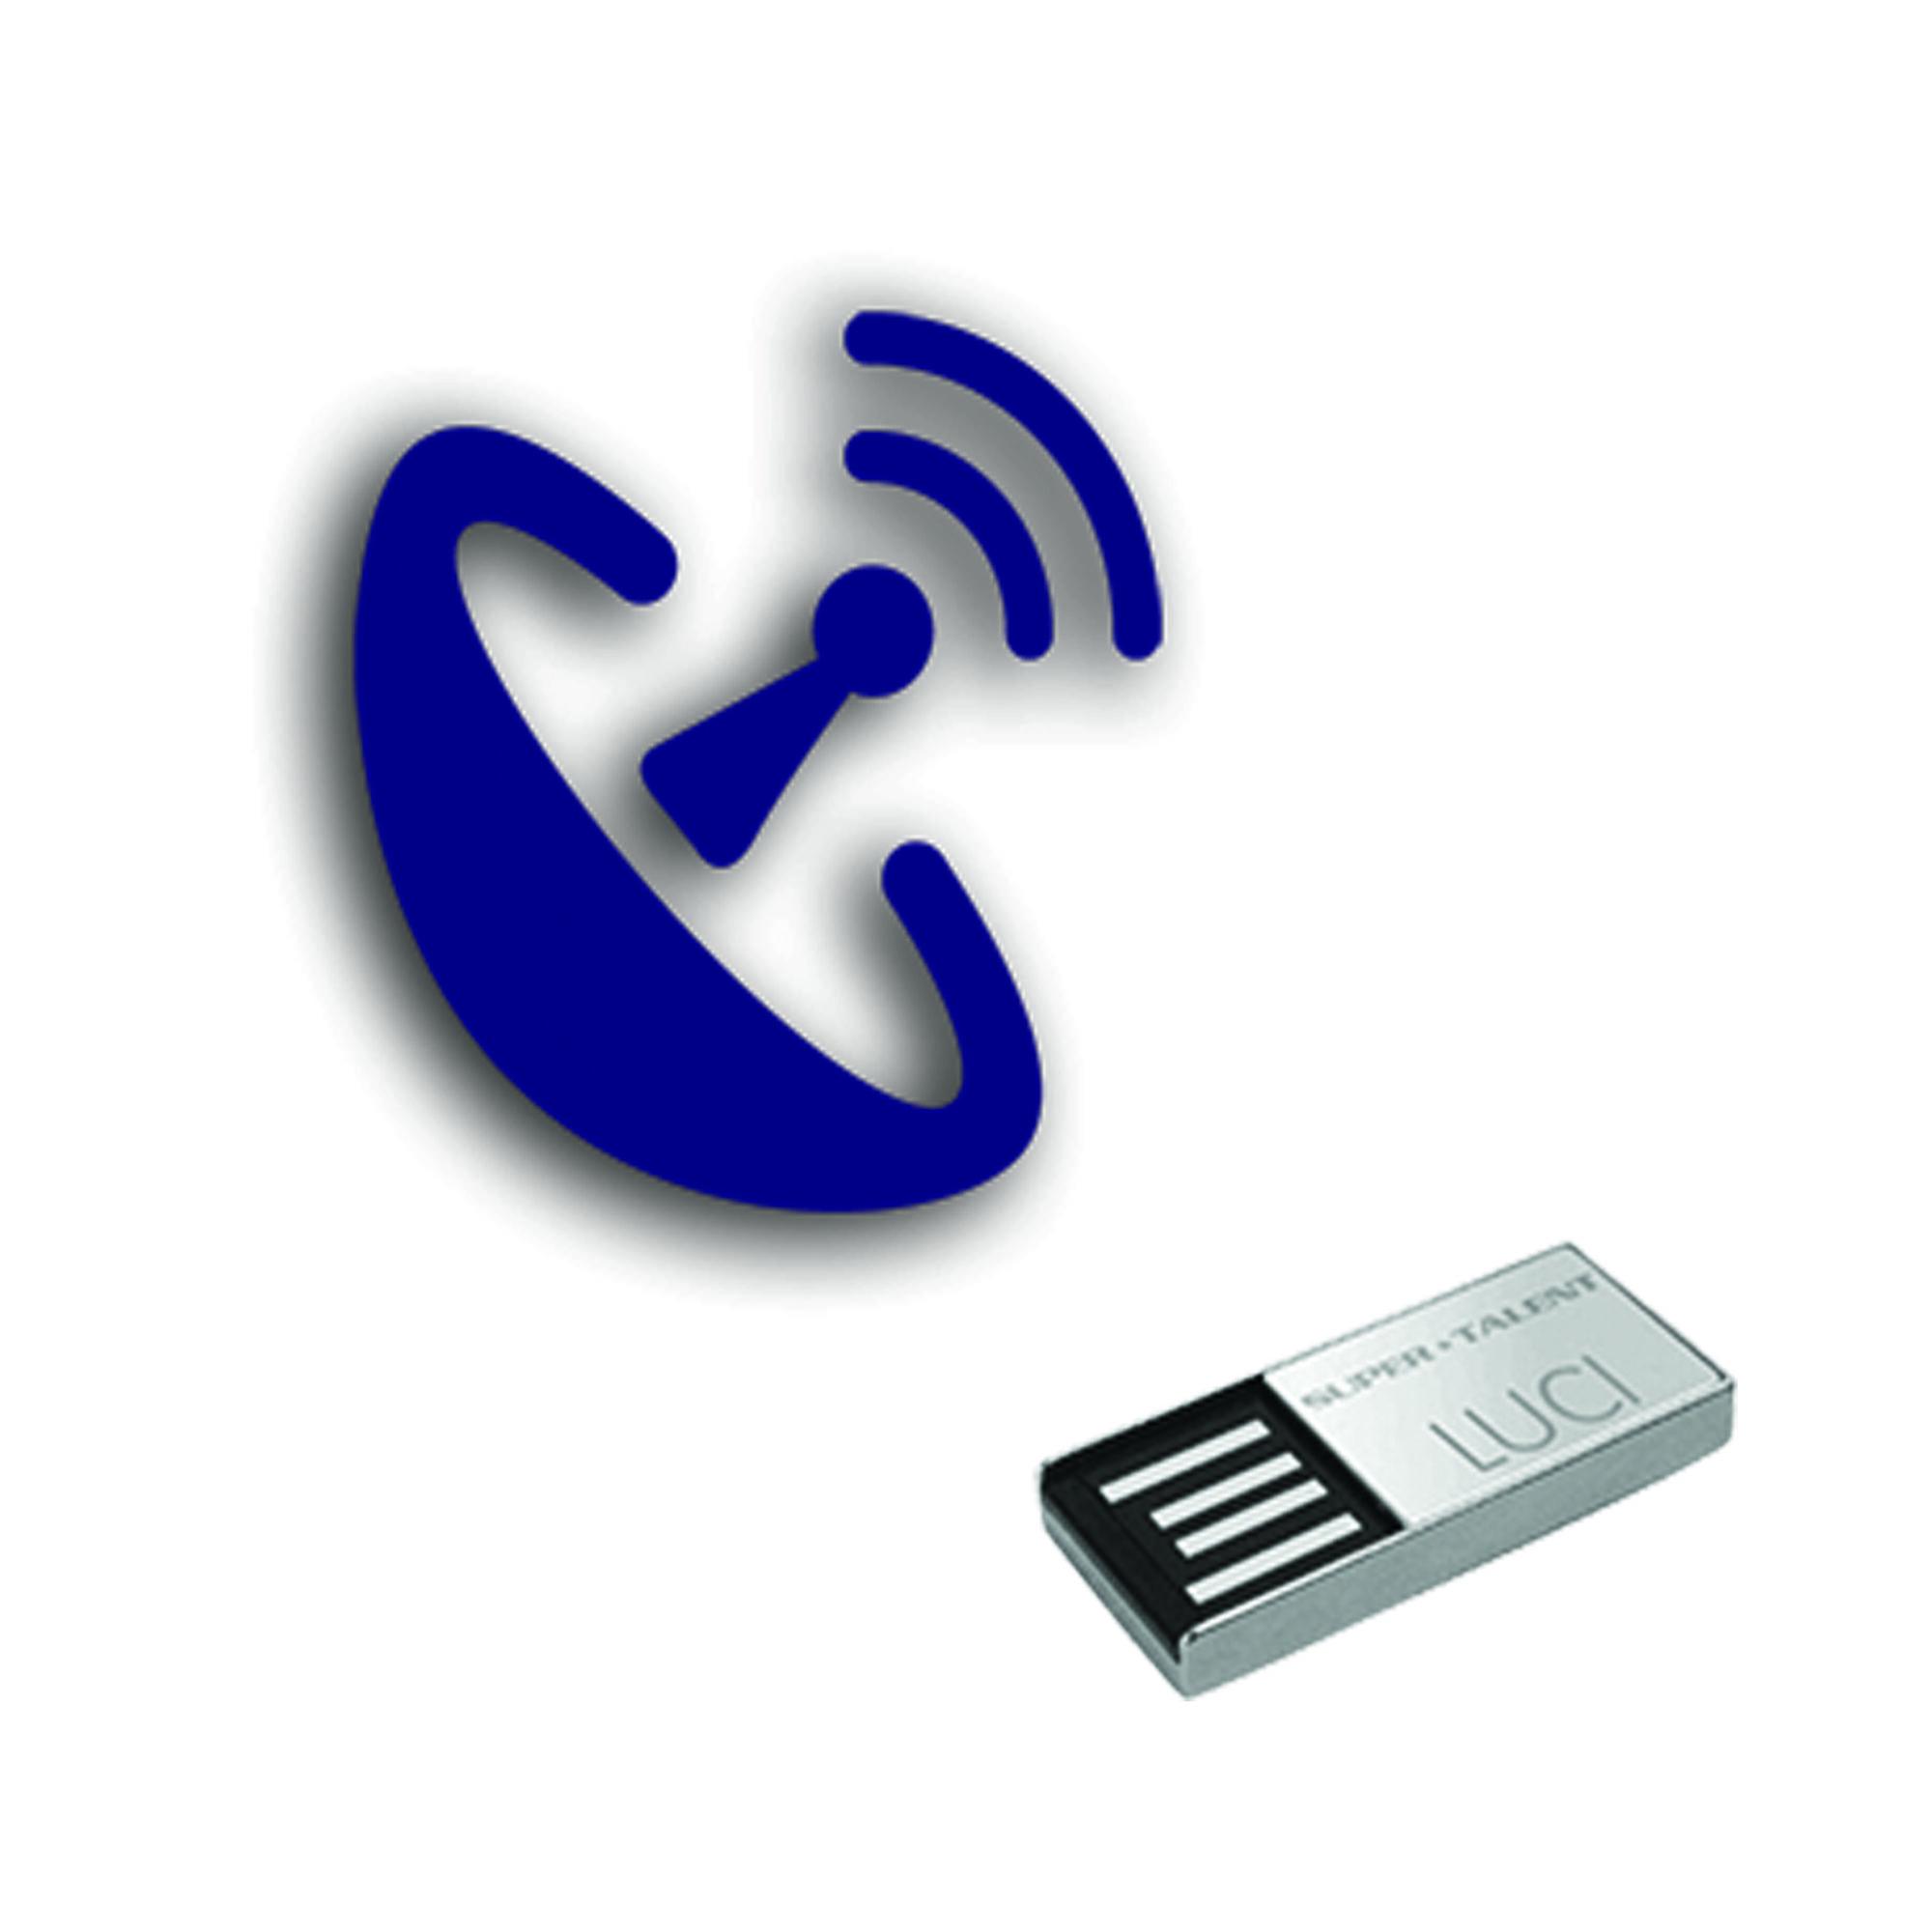 LUCI STUDIO USB Logiciel Codec  – Technica Delarte